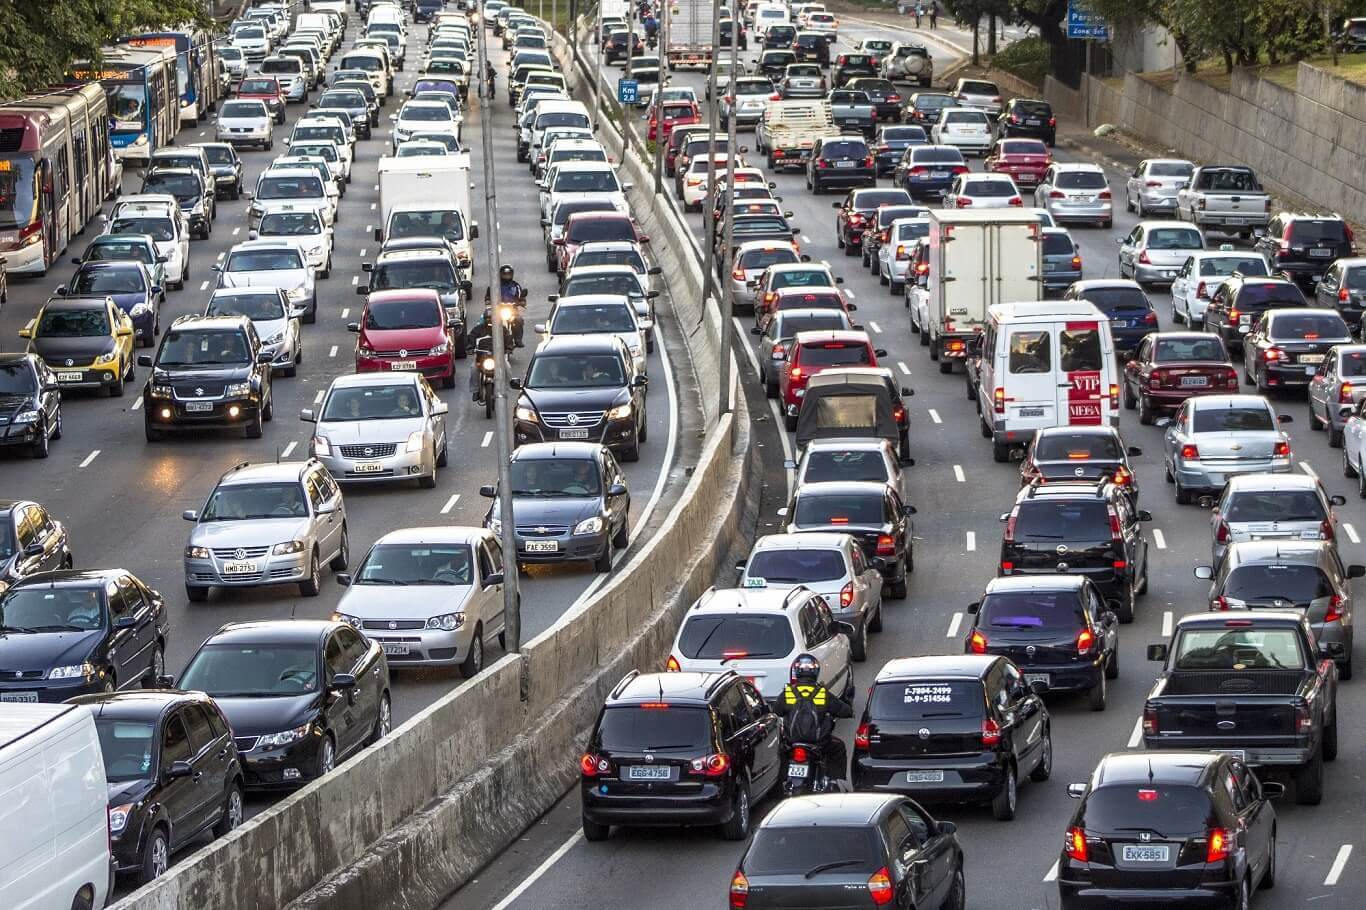 impeding traffic